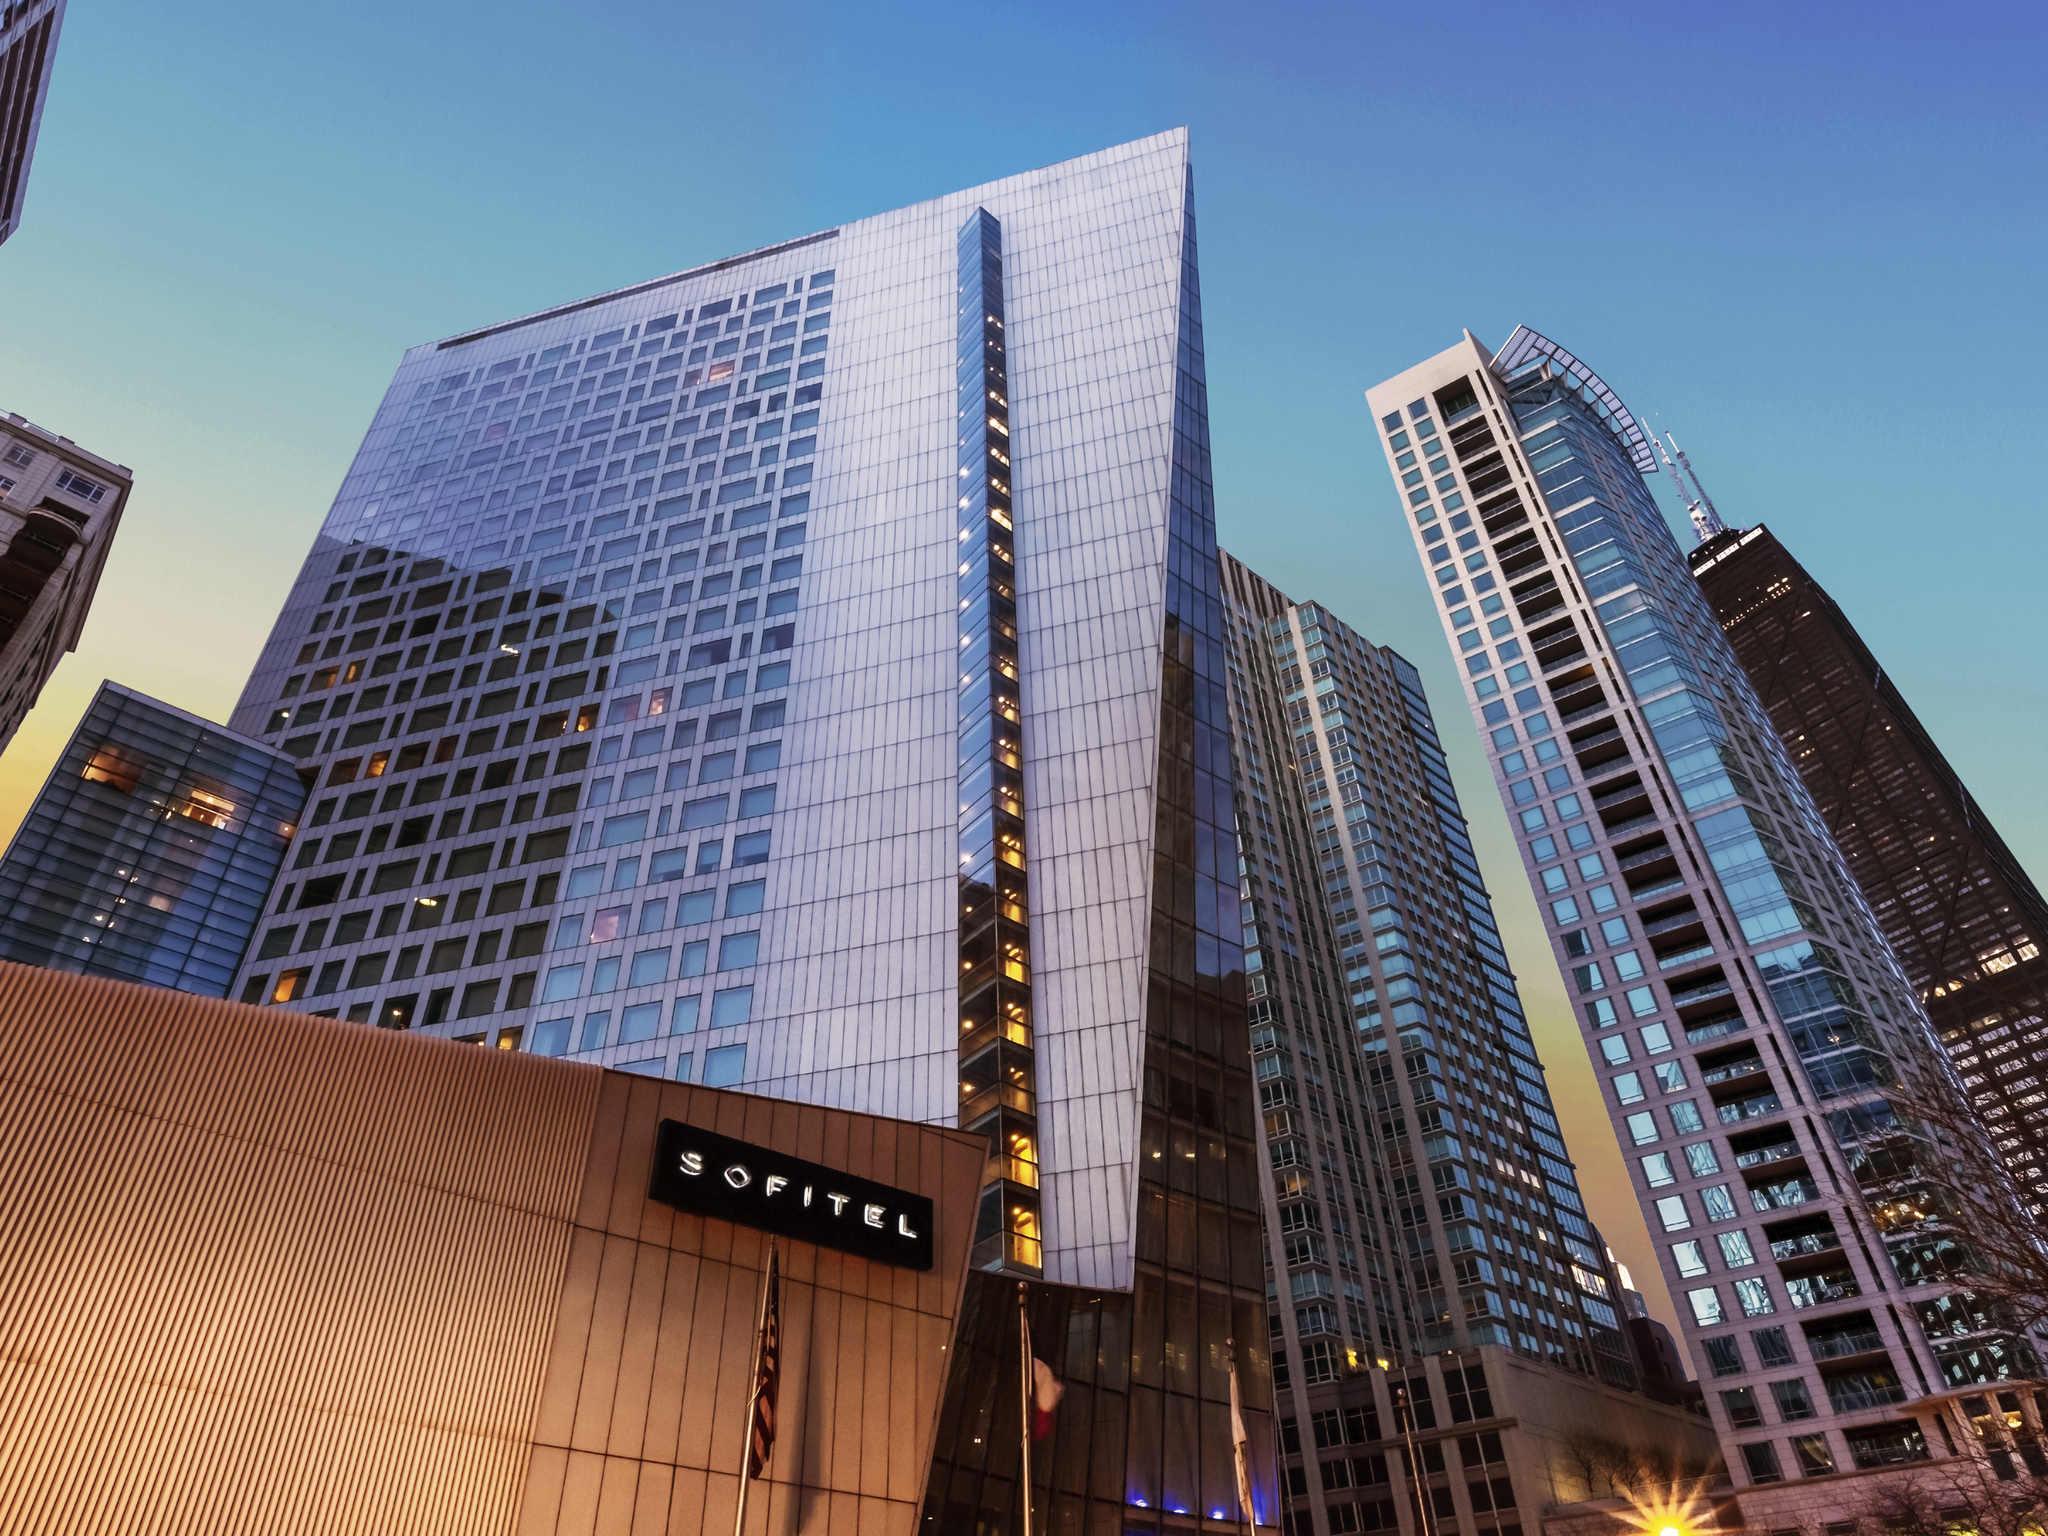 Hotell – Sofitel Chicago Magnificent Mile